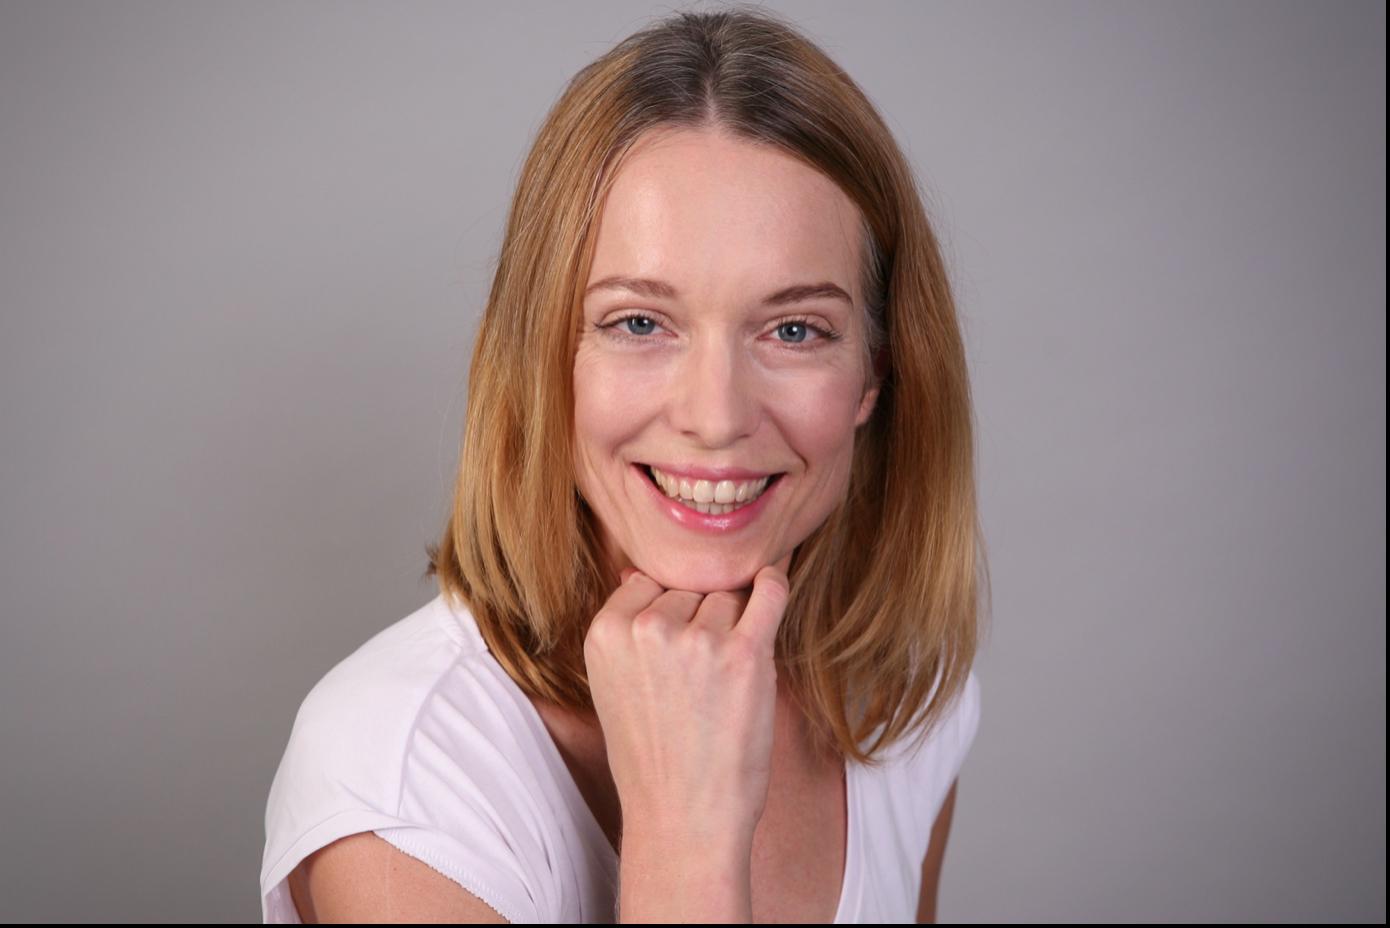 Linda Broschkowski